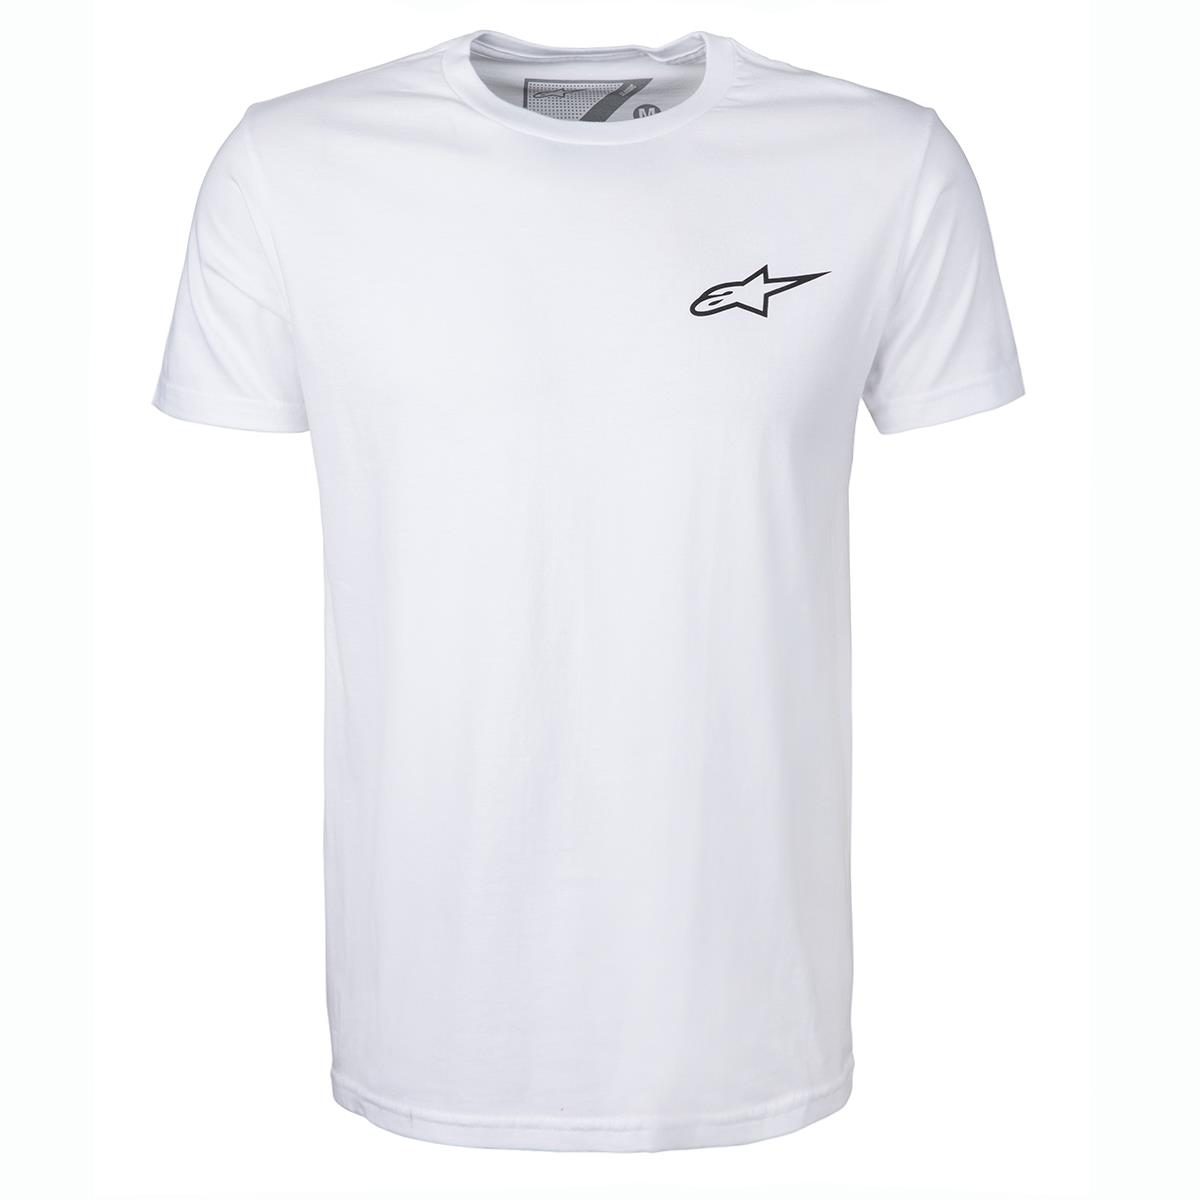 Alpinestars T-Shirt Neu Ageless Weiß/Schwarz